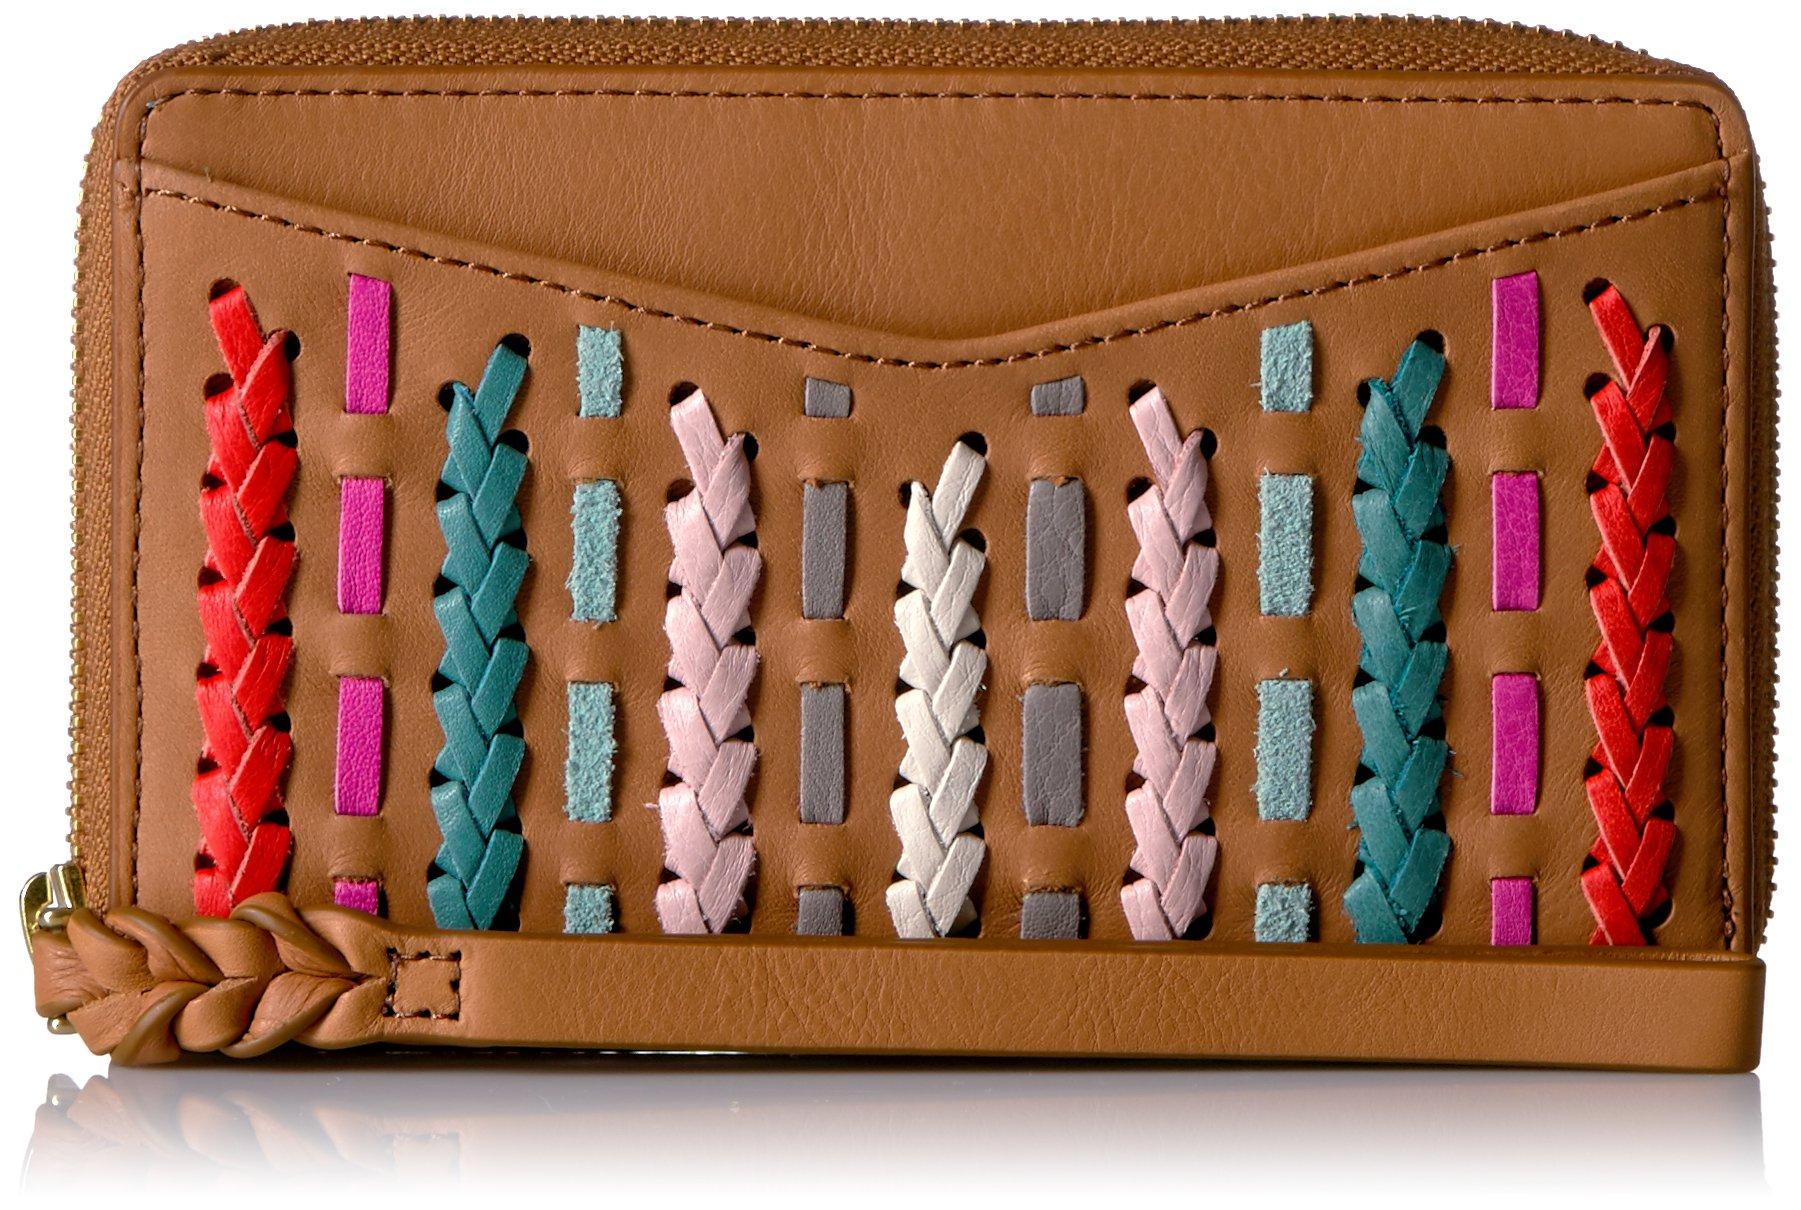 Caroline Rfid Phone Wallet Wallet, Neutral Multi, One Size